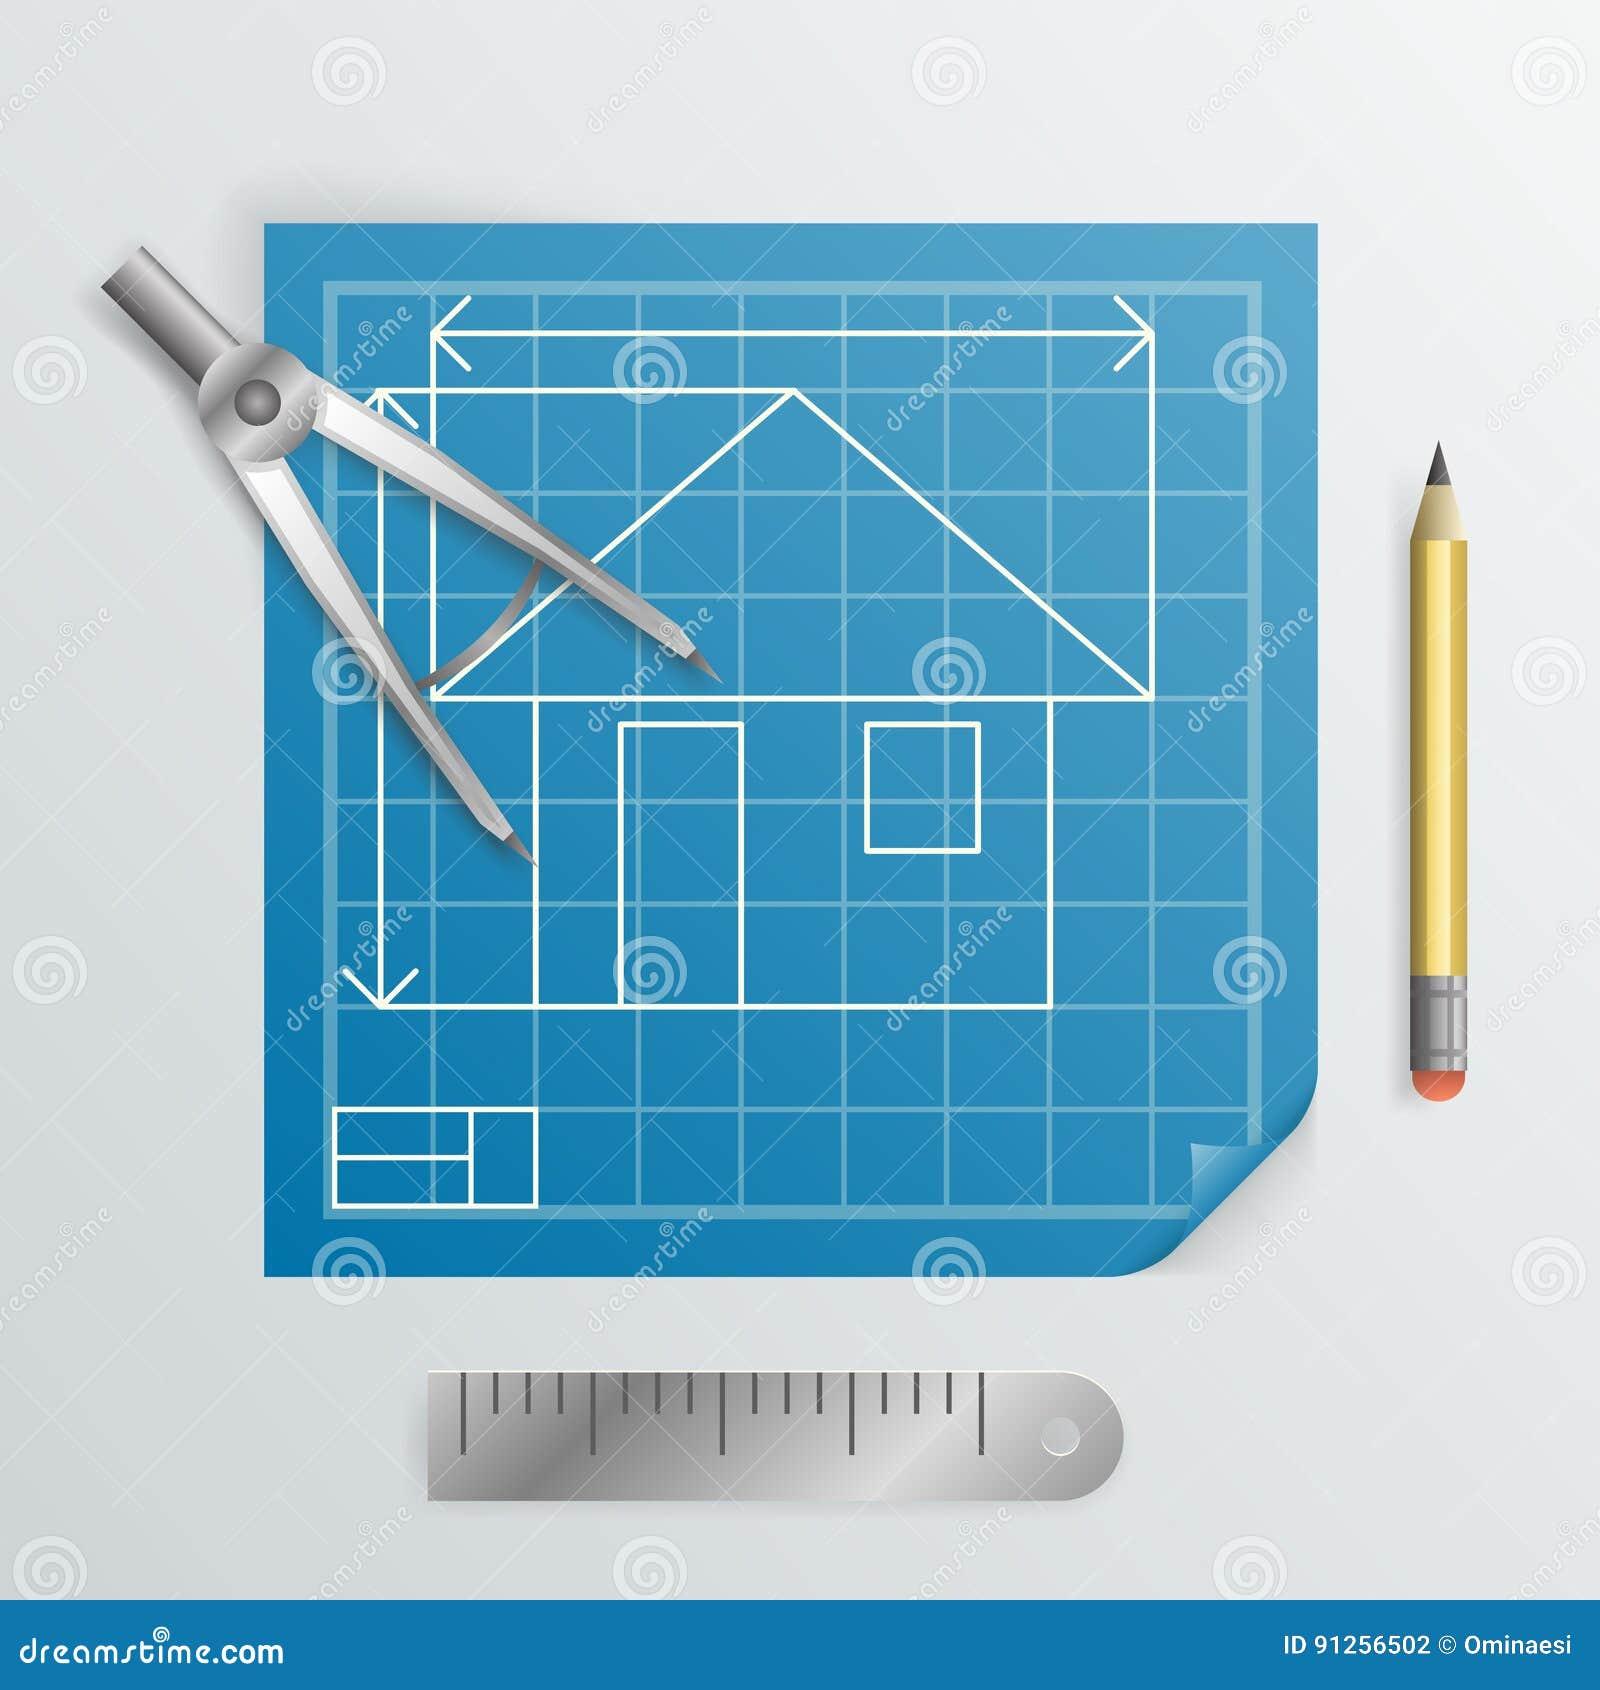 Compass Divider Engineering Planning Symbol Icon Blueprint